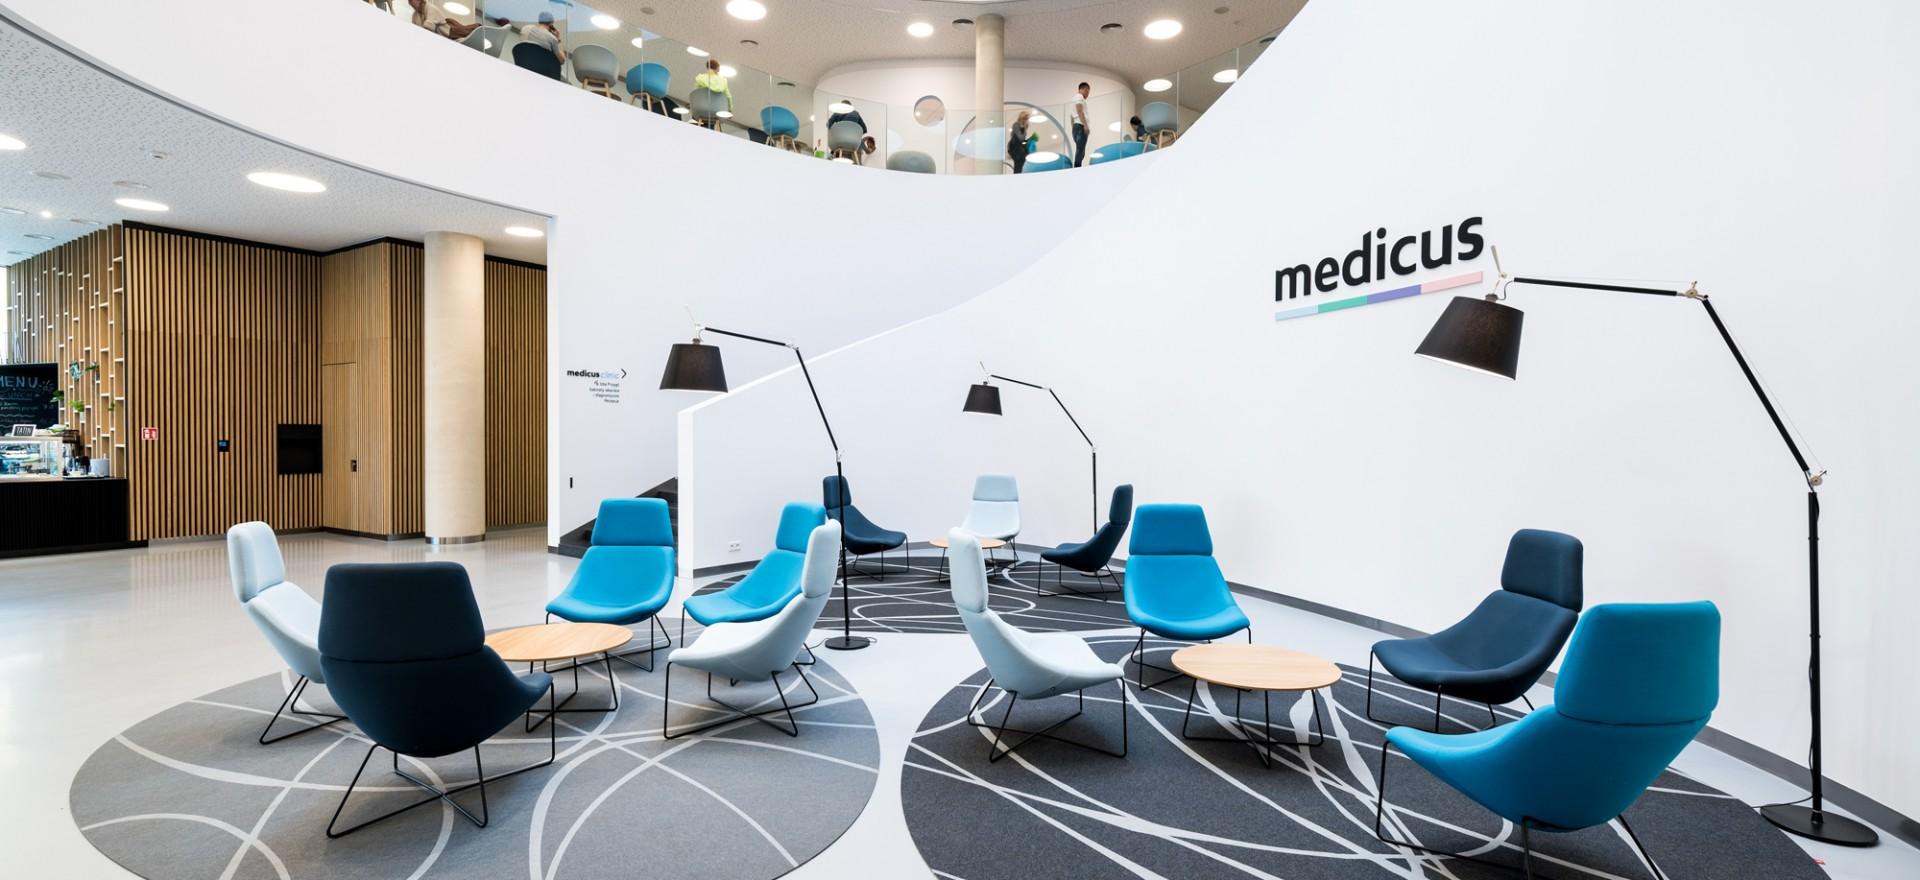 Medicus_Wroclaw 5